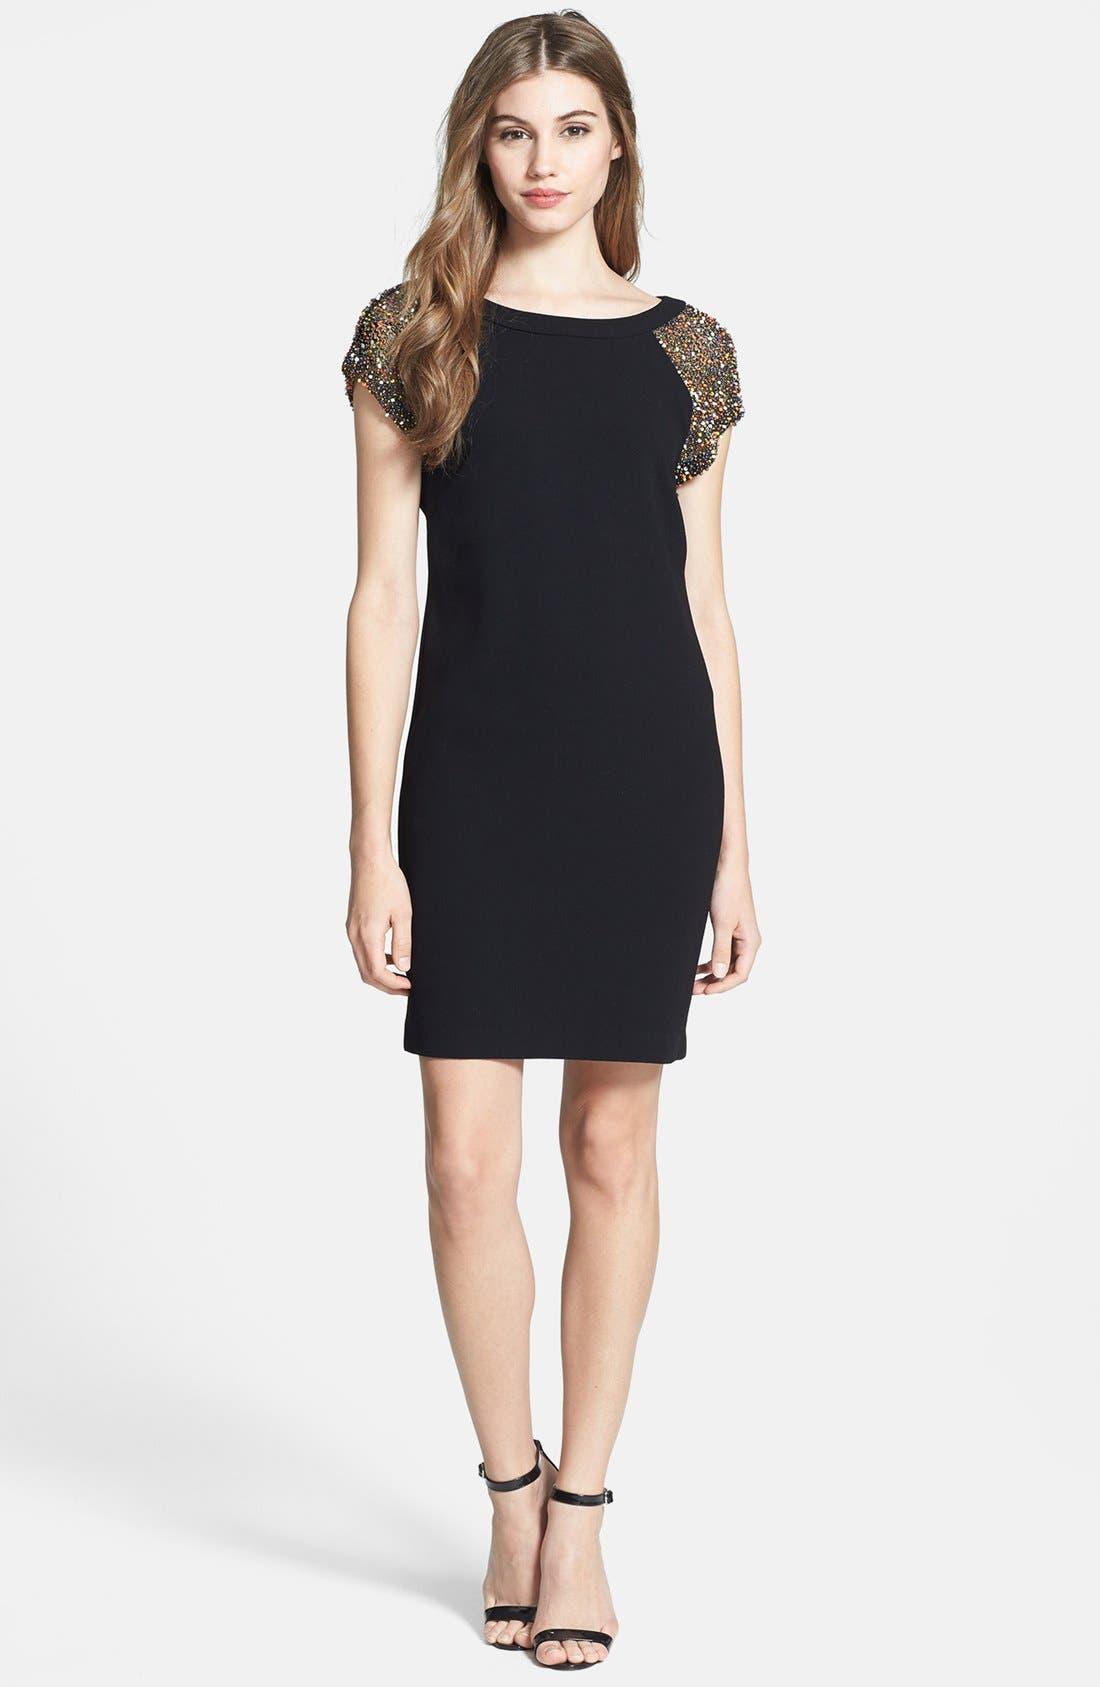 Alternate Image 1 Selected - Trina Turk 'Nettle' Embellished Crepe Dress